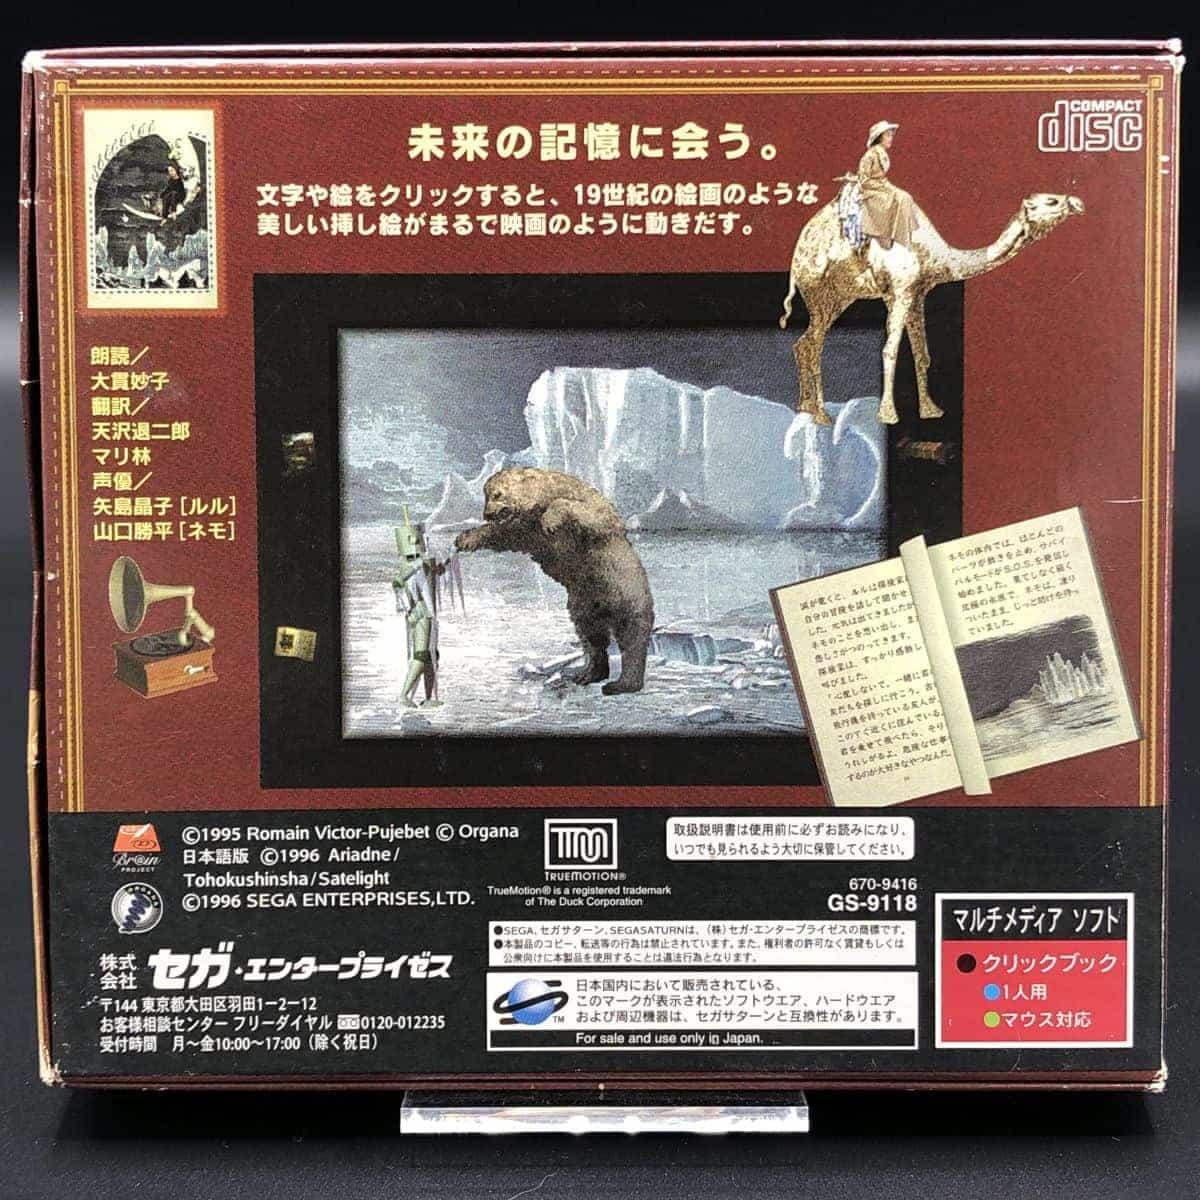 The Book of Lulu (Import Japan) (Komplett) (Gut) Sega Saturn